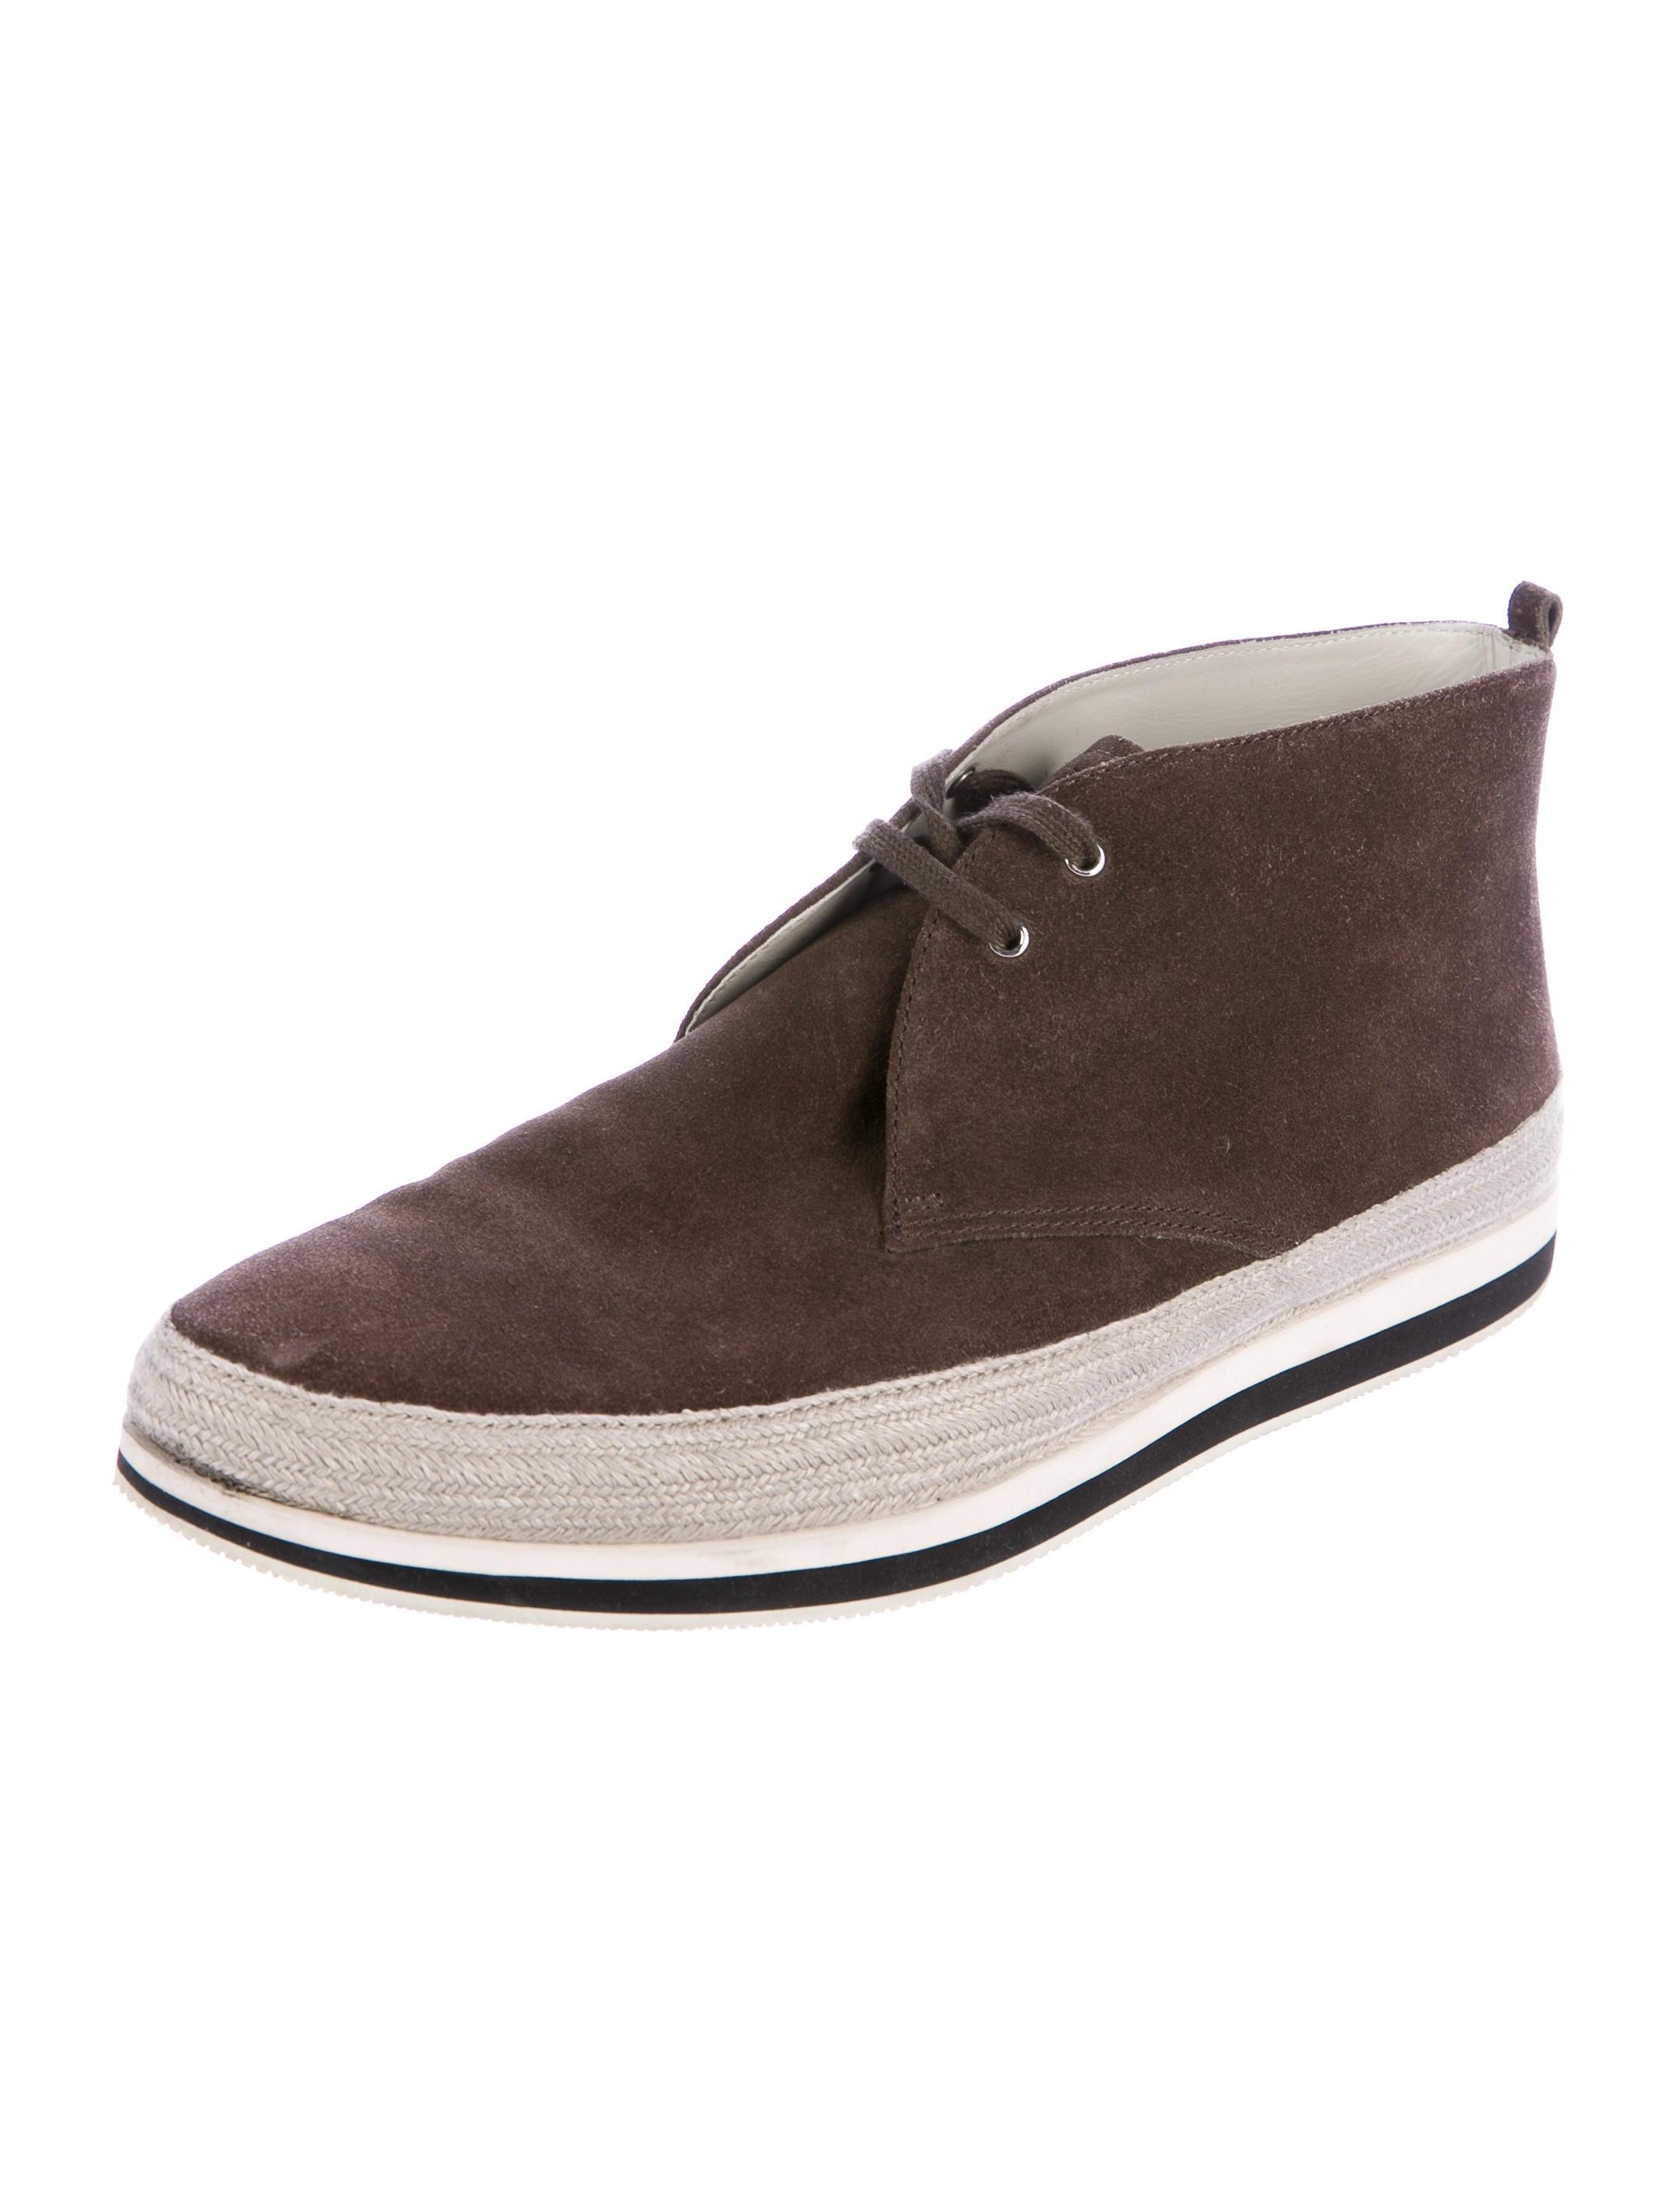 prada sport suede chukka boots shoes wpr45120 the